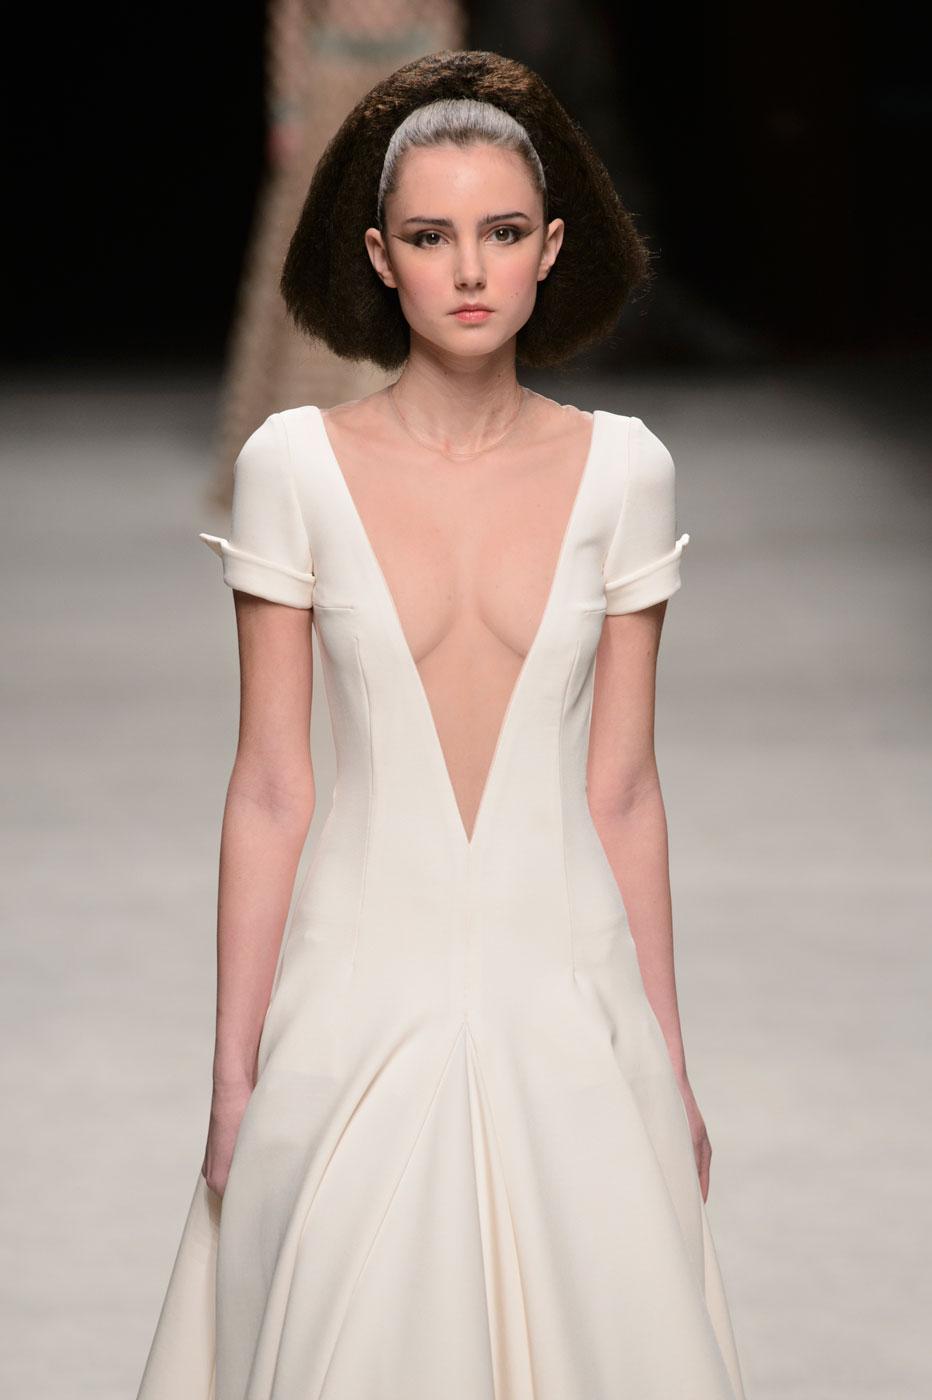 Julien-Fournie-Prive-fashion-runway-show-haute-couture-paris-spring-2015-the-impression-37